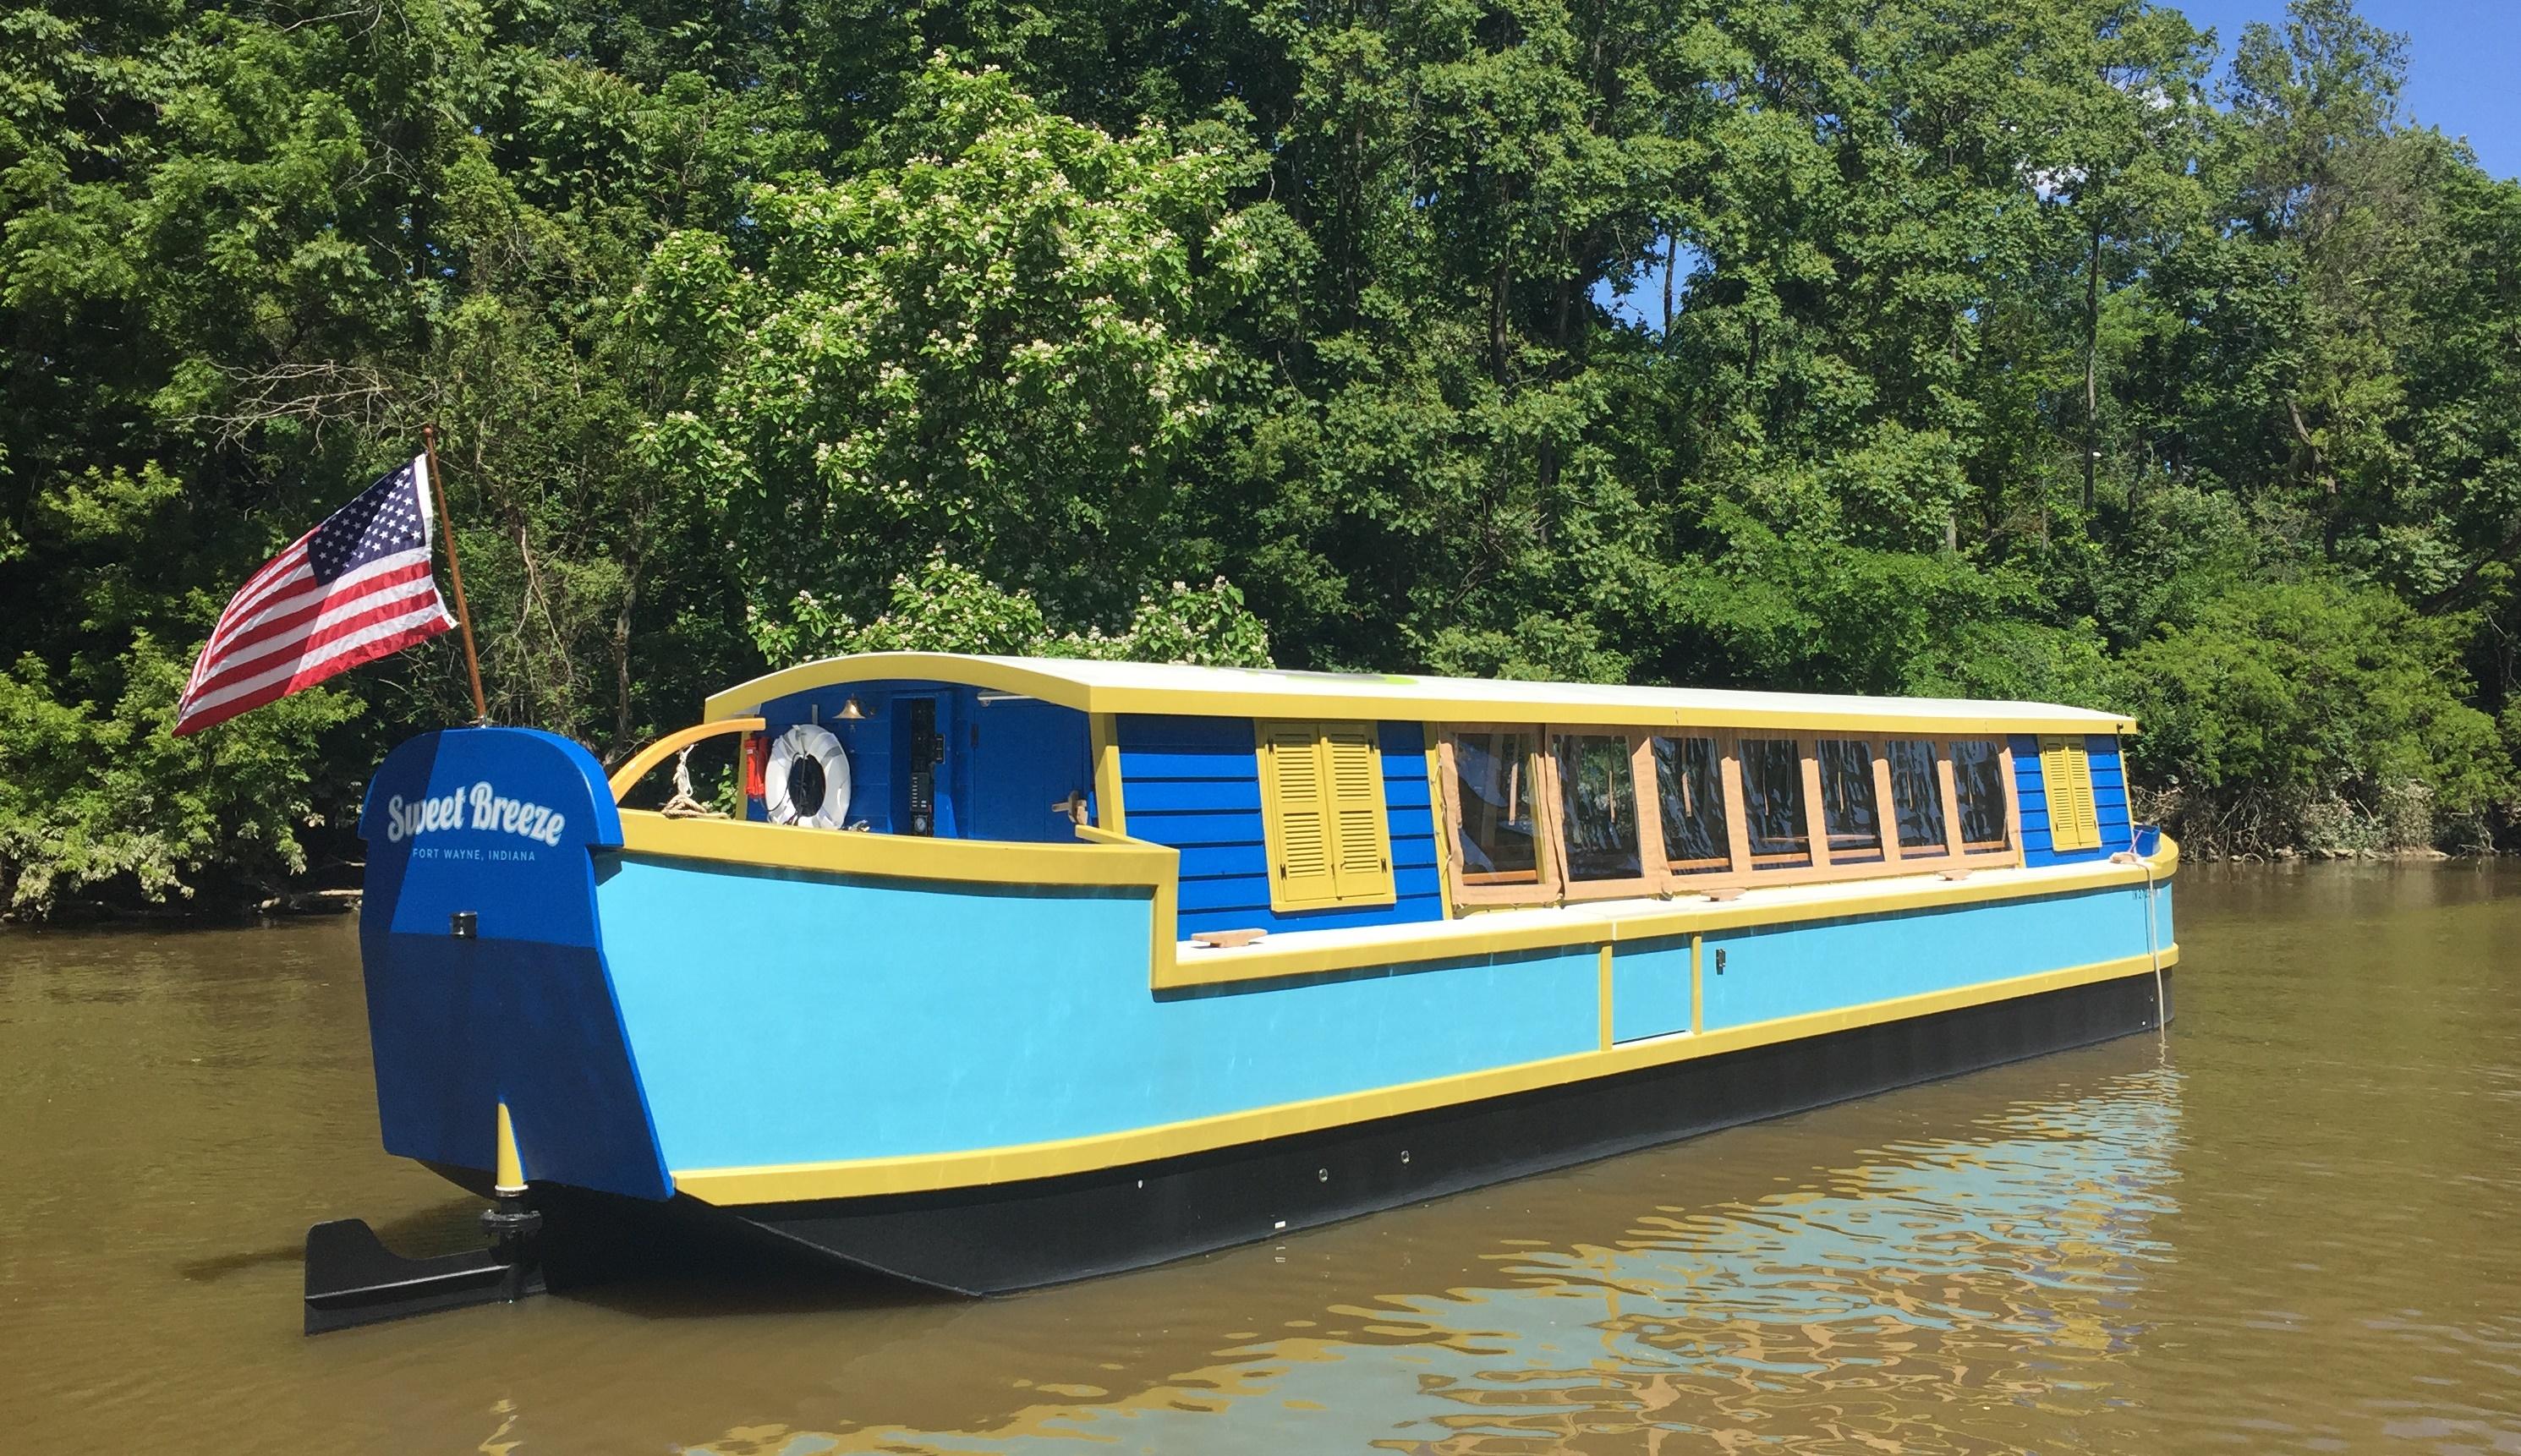 sweet breeze settles in on fort wayne rivers northeast indiana public radio sweet breeze settles in on fort wayne